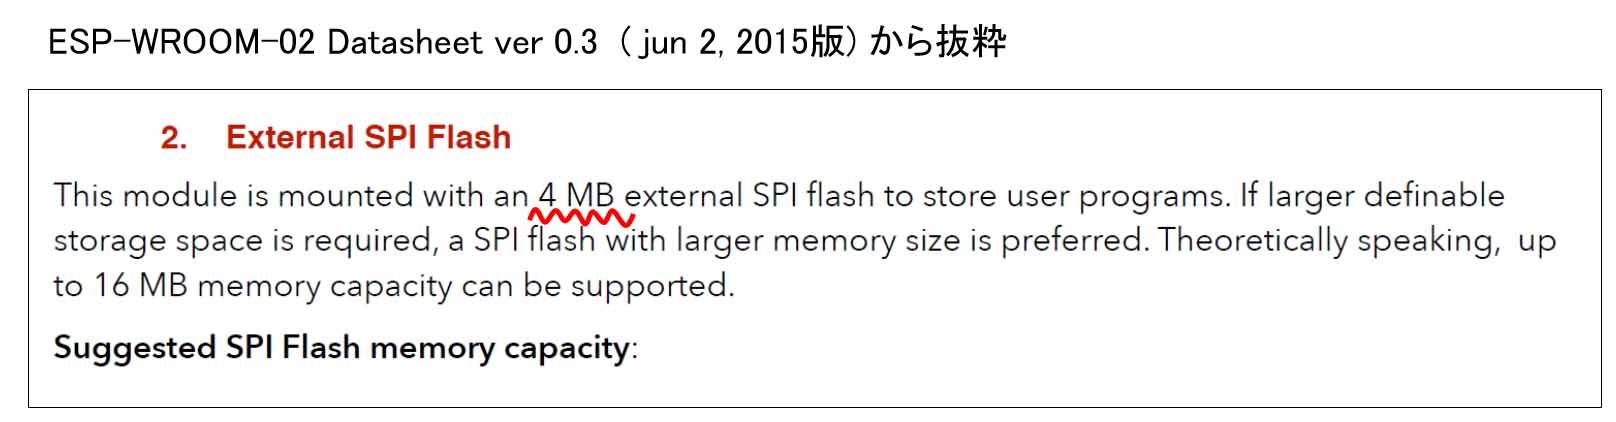 esp8266_chip_info_01.jpg